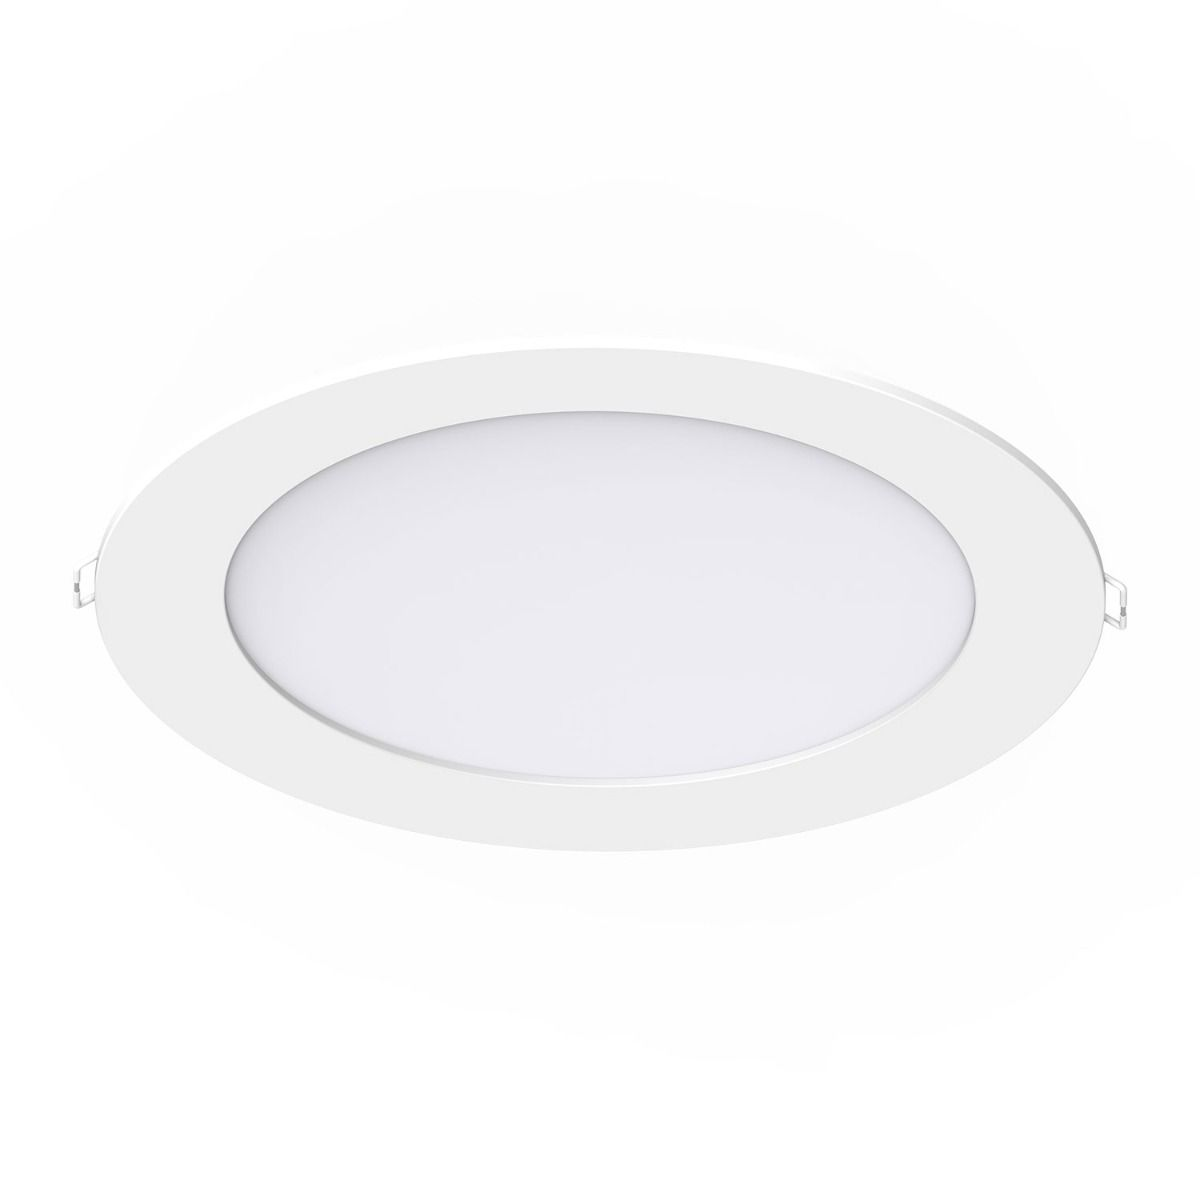 Noxion LEDDownlight SlimV2.0IP44 24W4000K Utskärning   Ø200mm w/ DALI